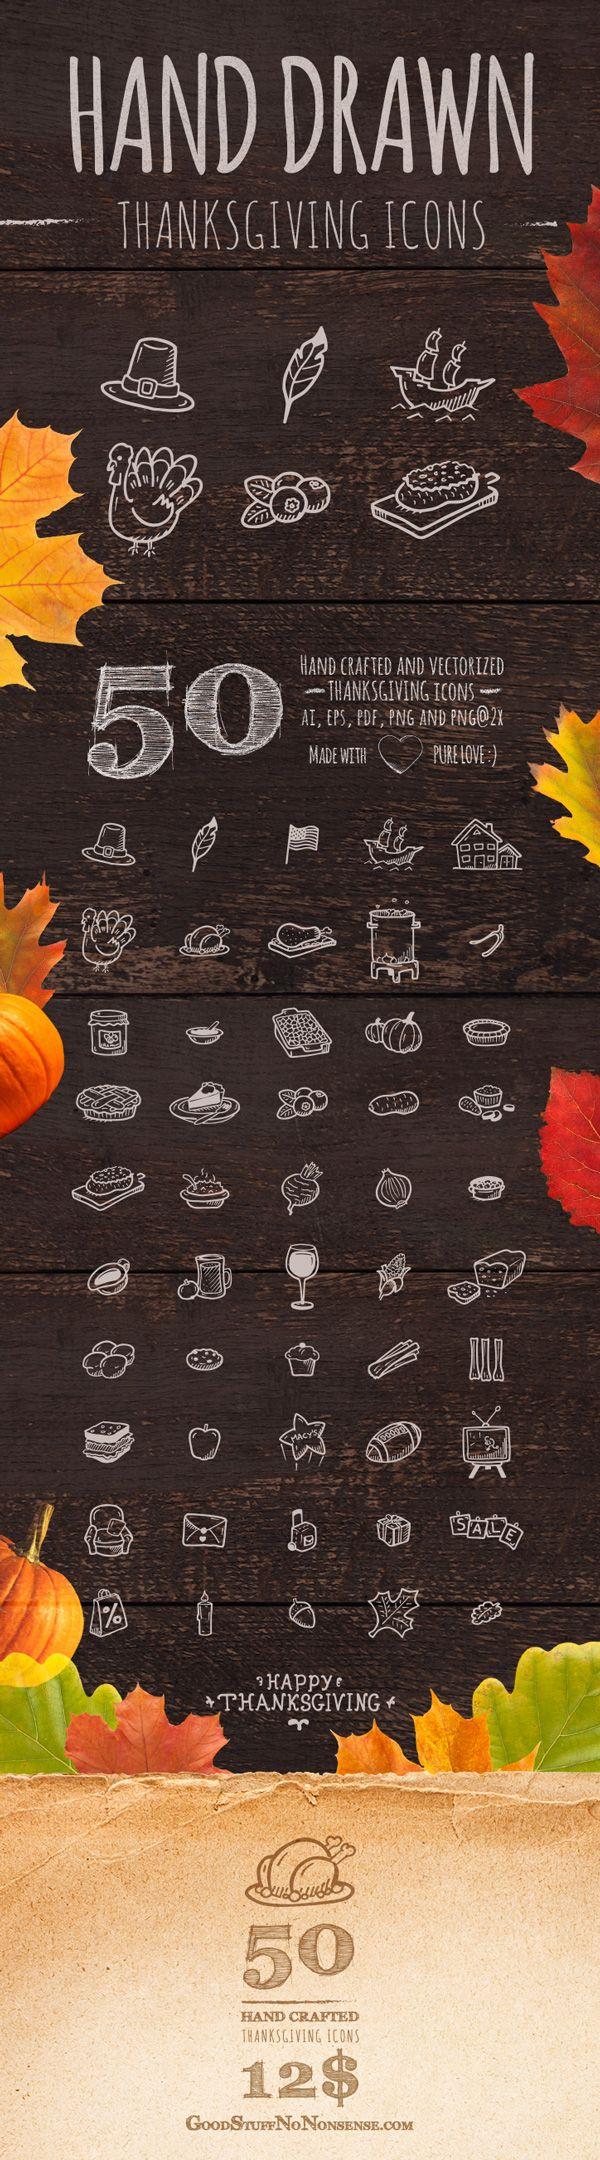 50 Thanksgiving Icons by Agata Kuczminska